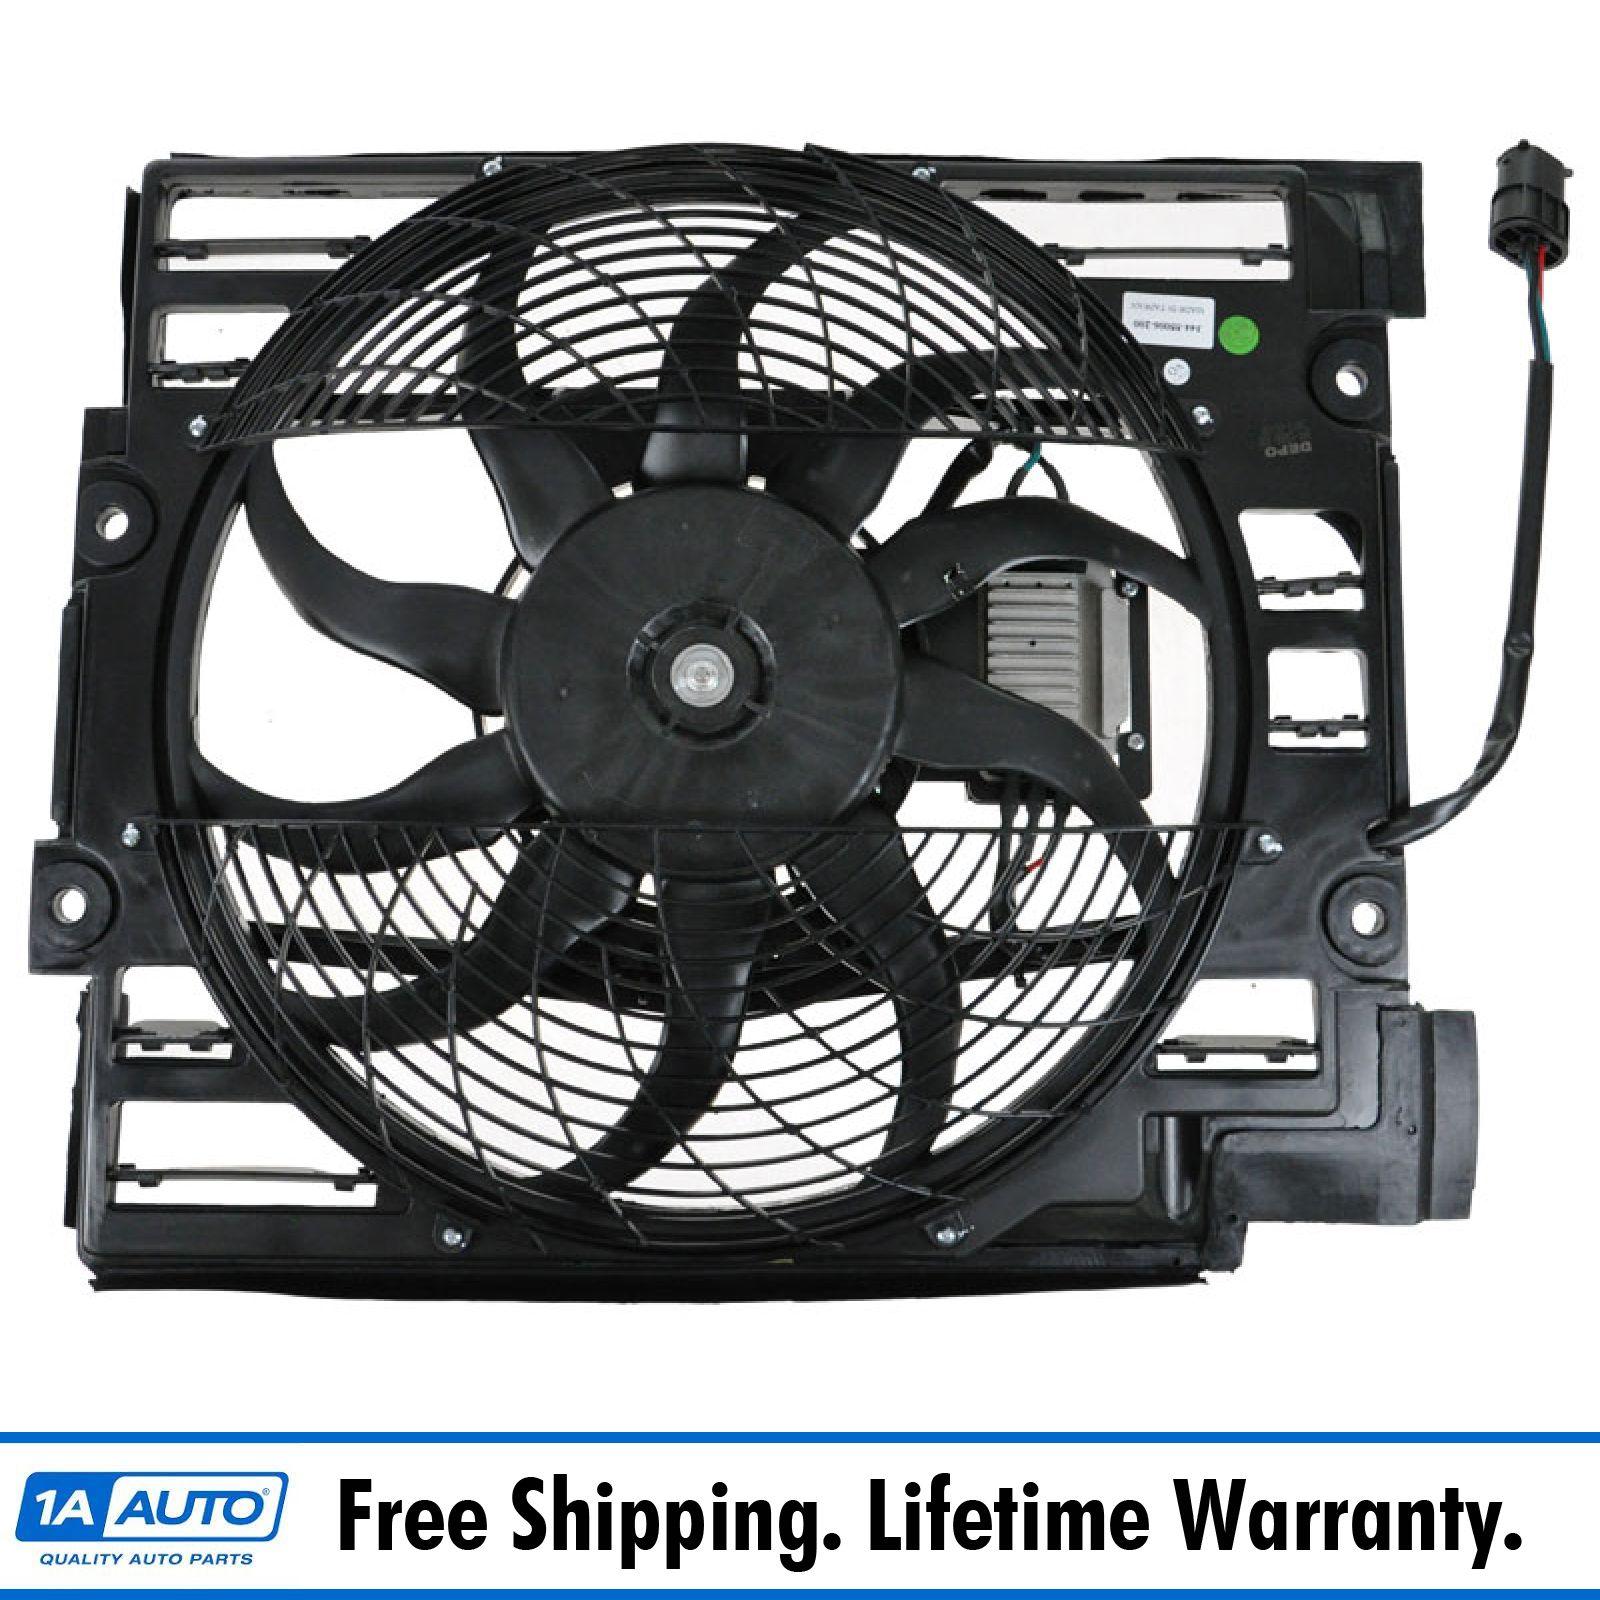 Radiator Pusher Cooling Fan Assembly for BMW 525i 528i 528iT 530i 540i M5 E39